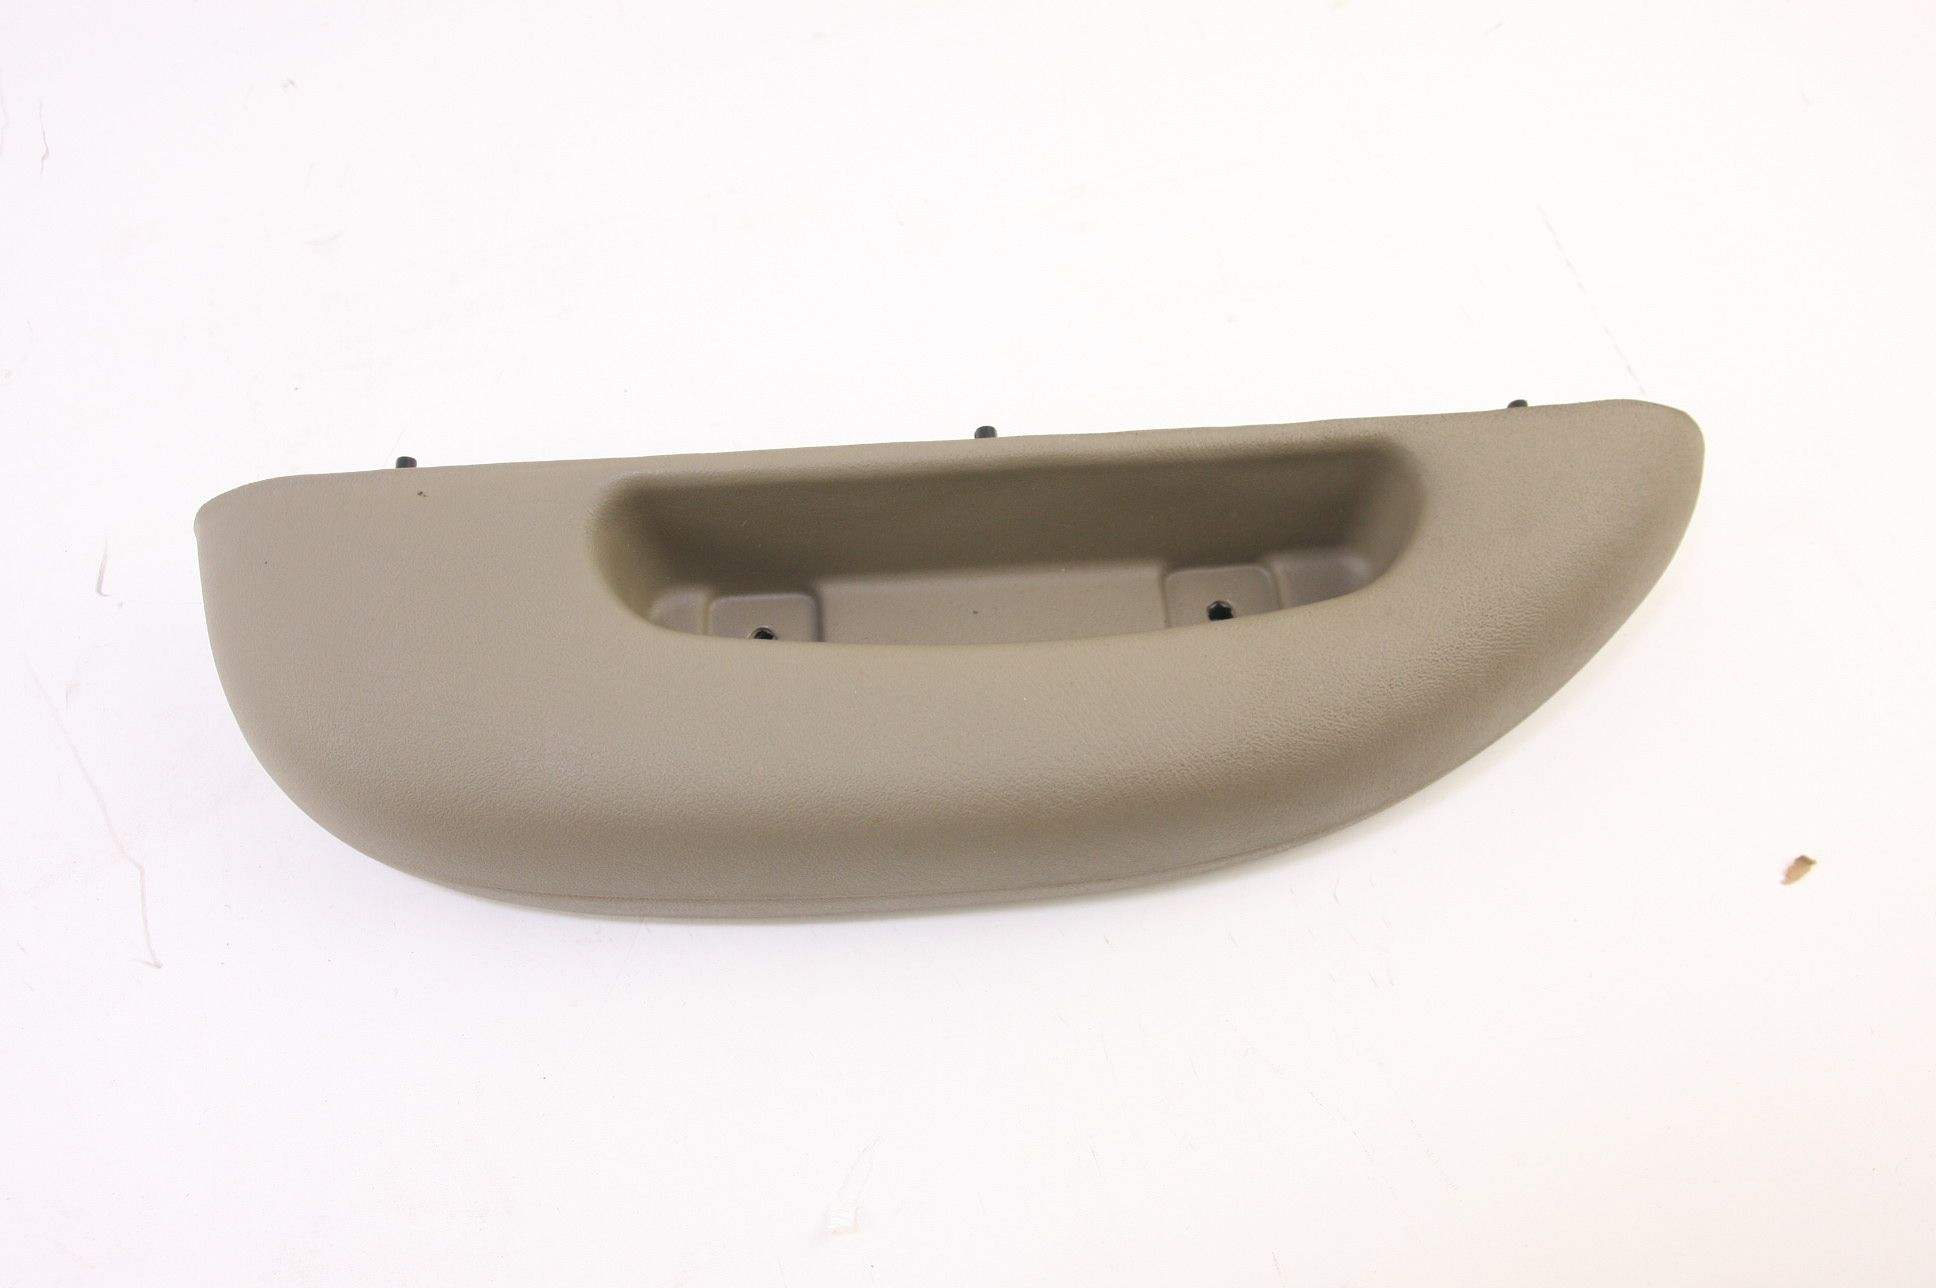 *** New OEM 12376621 GM LH Door Panel Armrest Tan 96-02 Chevy Express GMC Savana - image 1